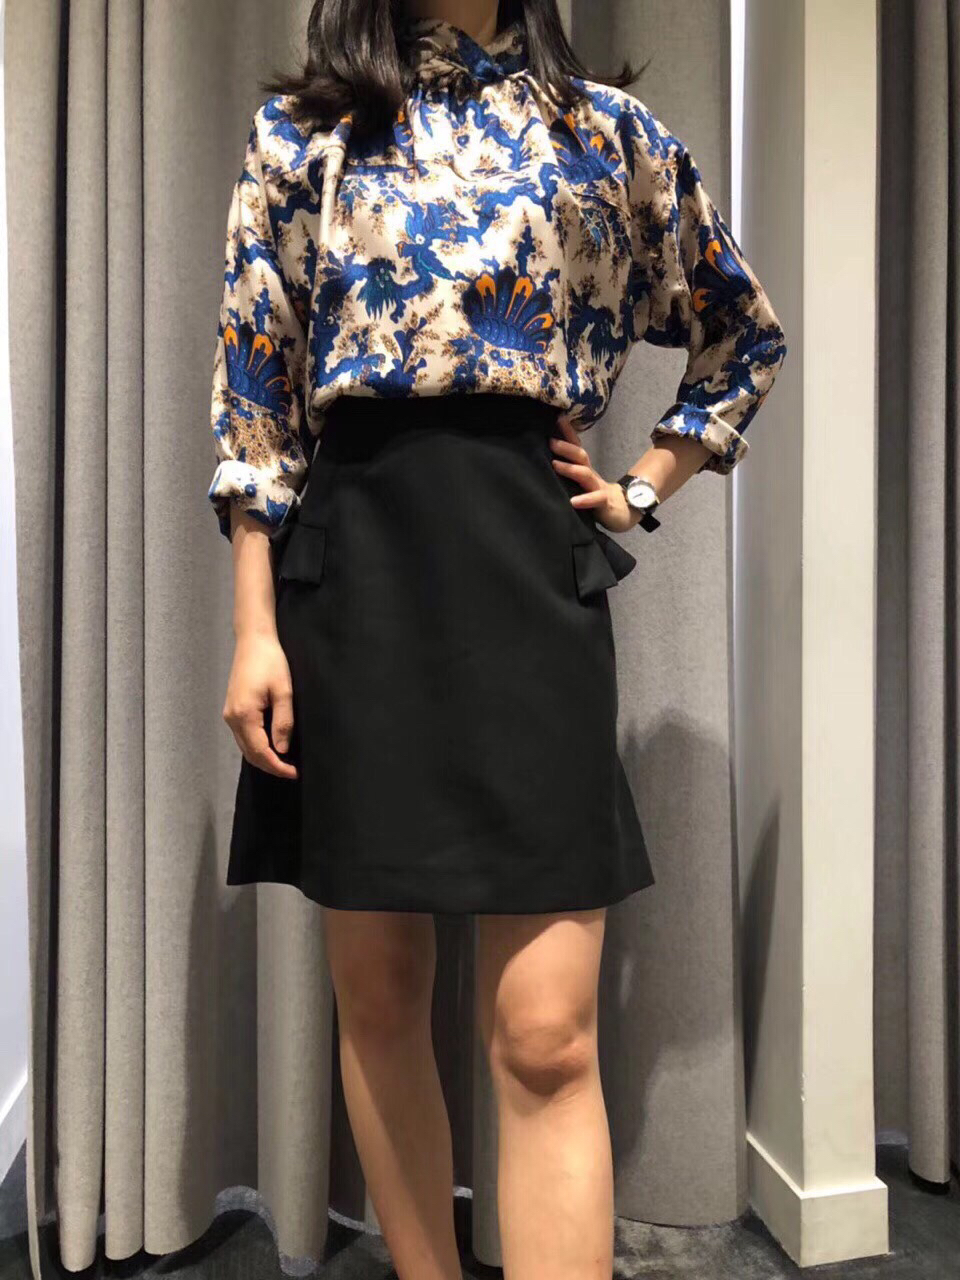 Cuello Alta Camisas Casual Larga Manga Llegada Otoño Blusa Nueva Mujeres Retro De q1FtwCtxT